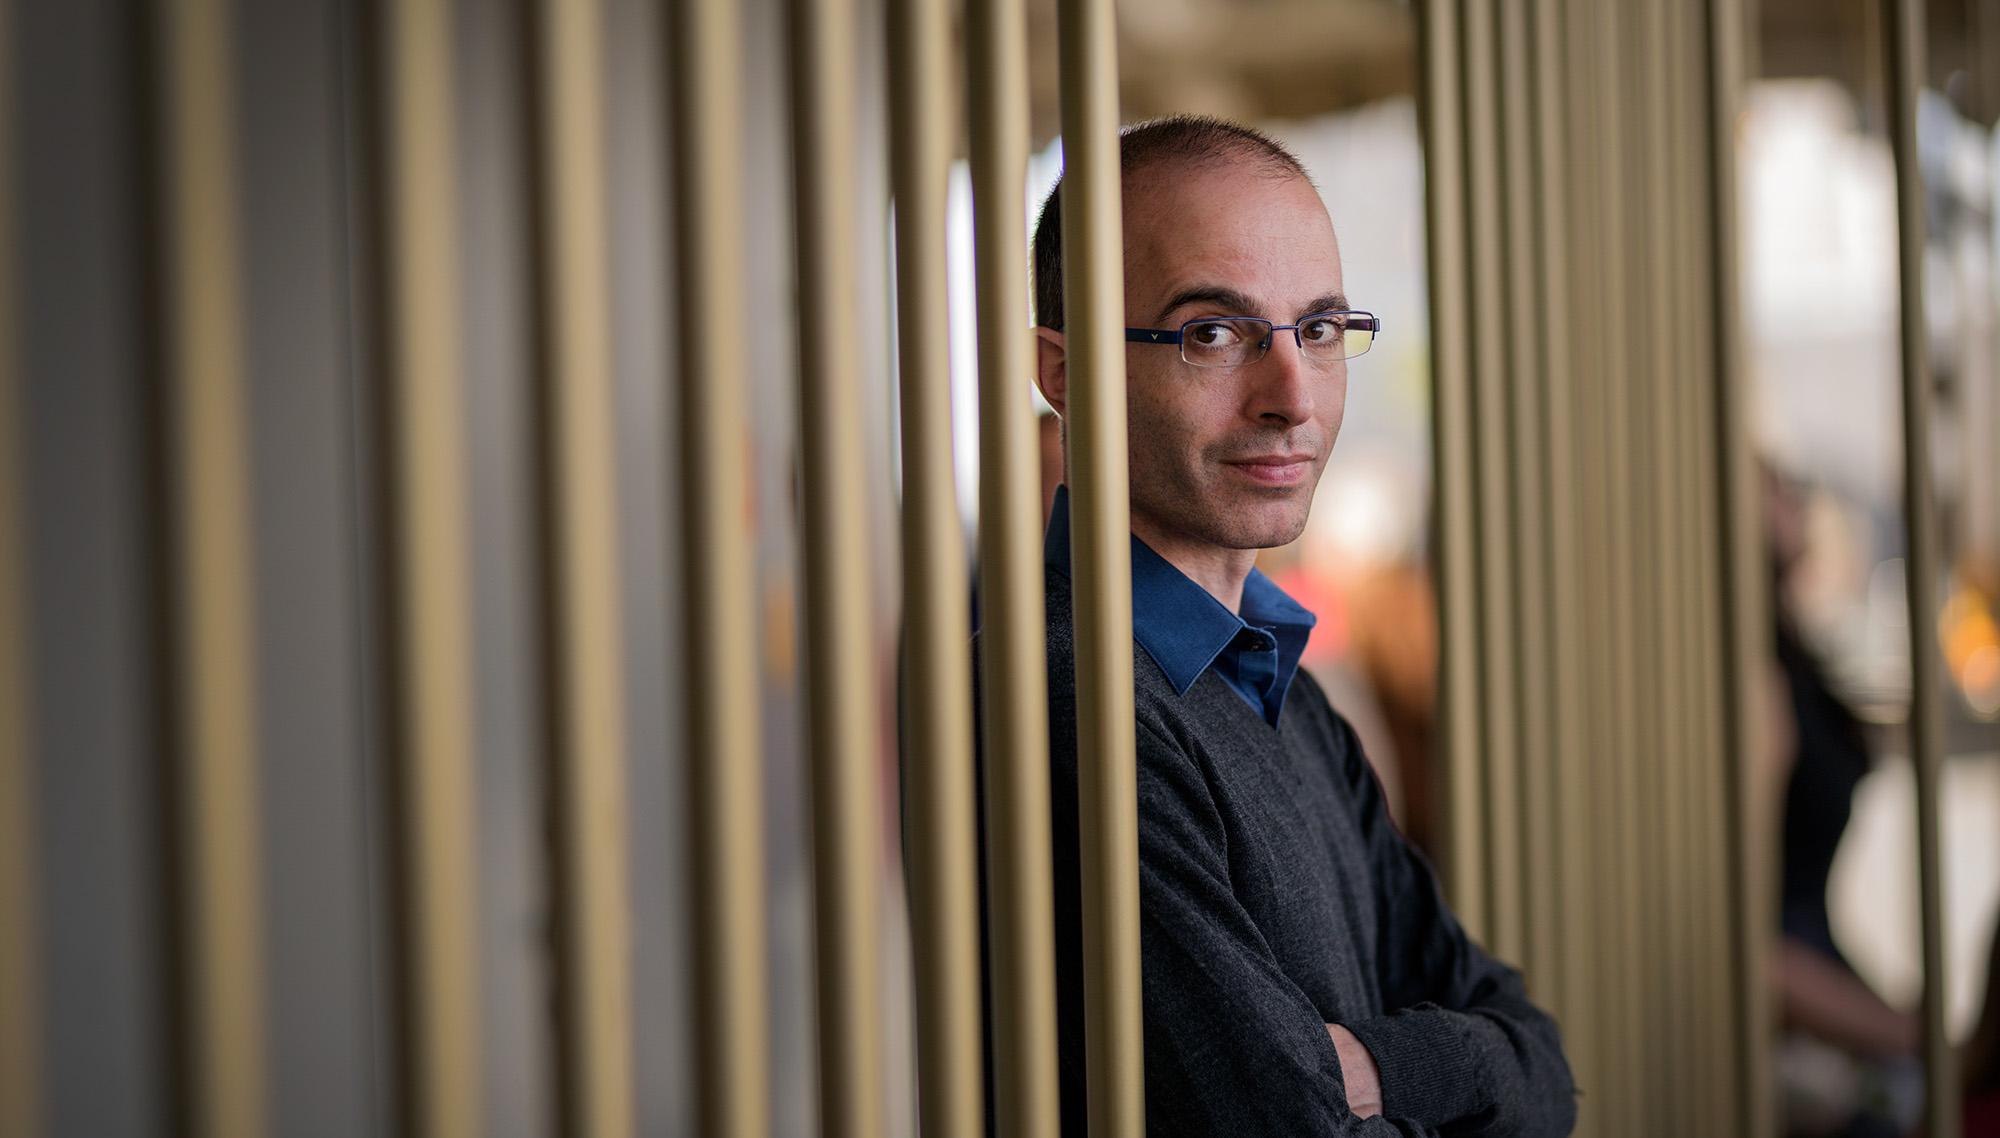 Tác giả Yuval Noah Harari